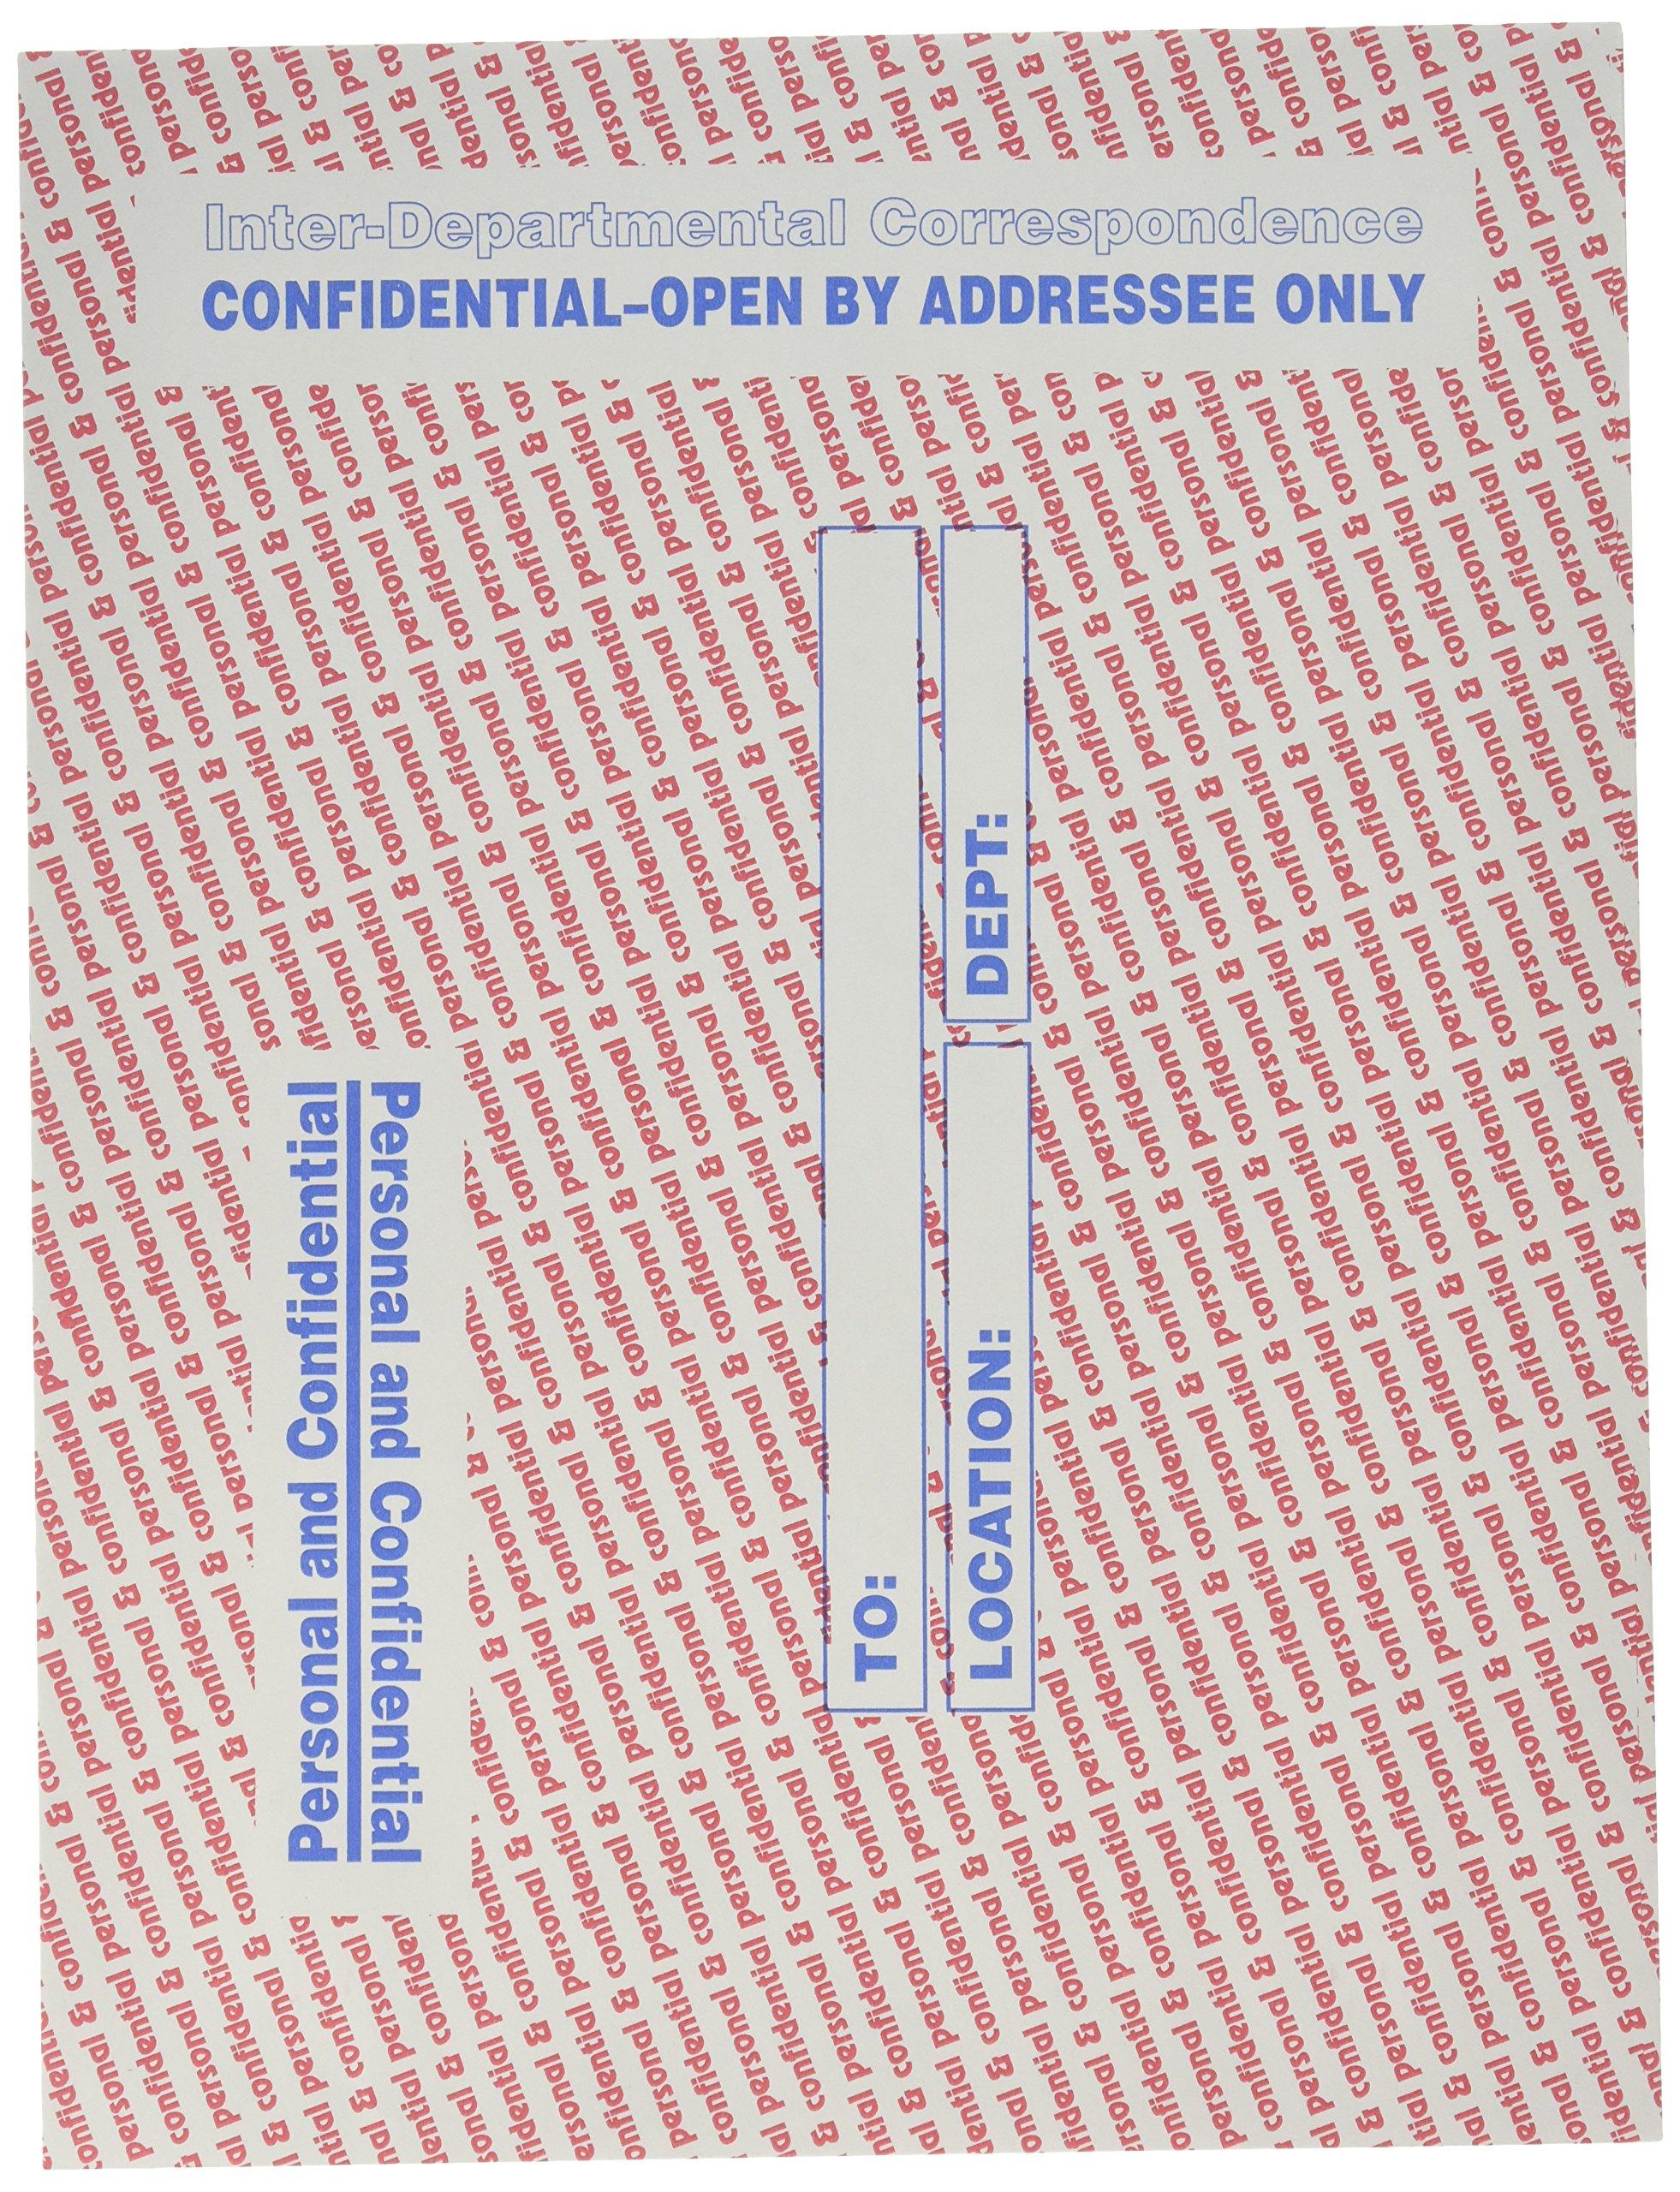 Quality Park Interdepartmental Envelopes, 10 x13, Gray, (QUA63778) 100 count. by Quality Park